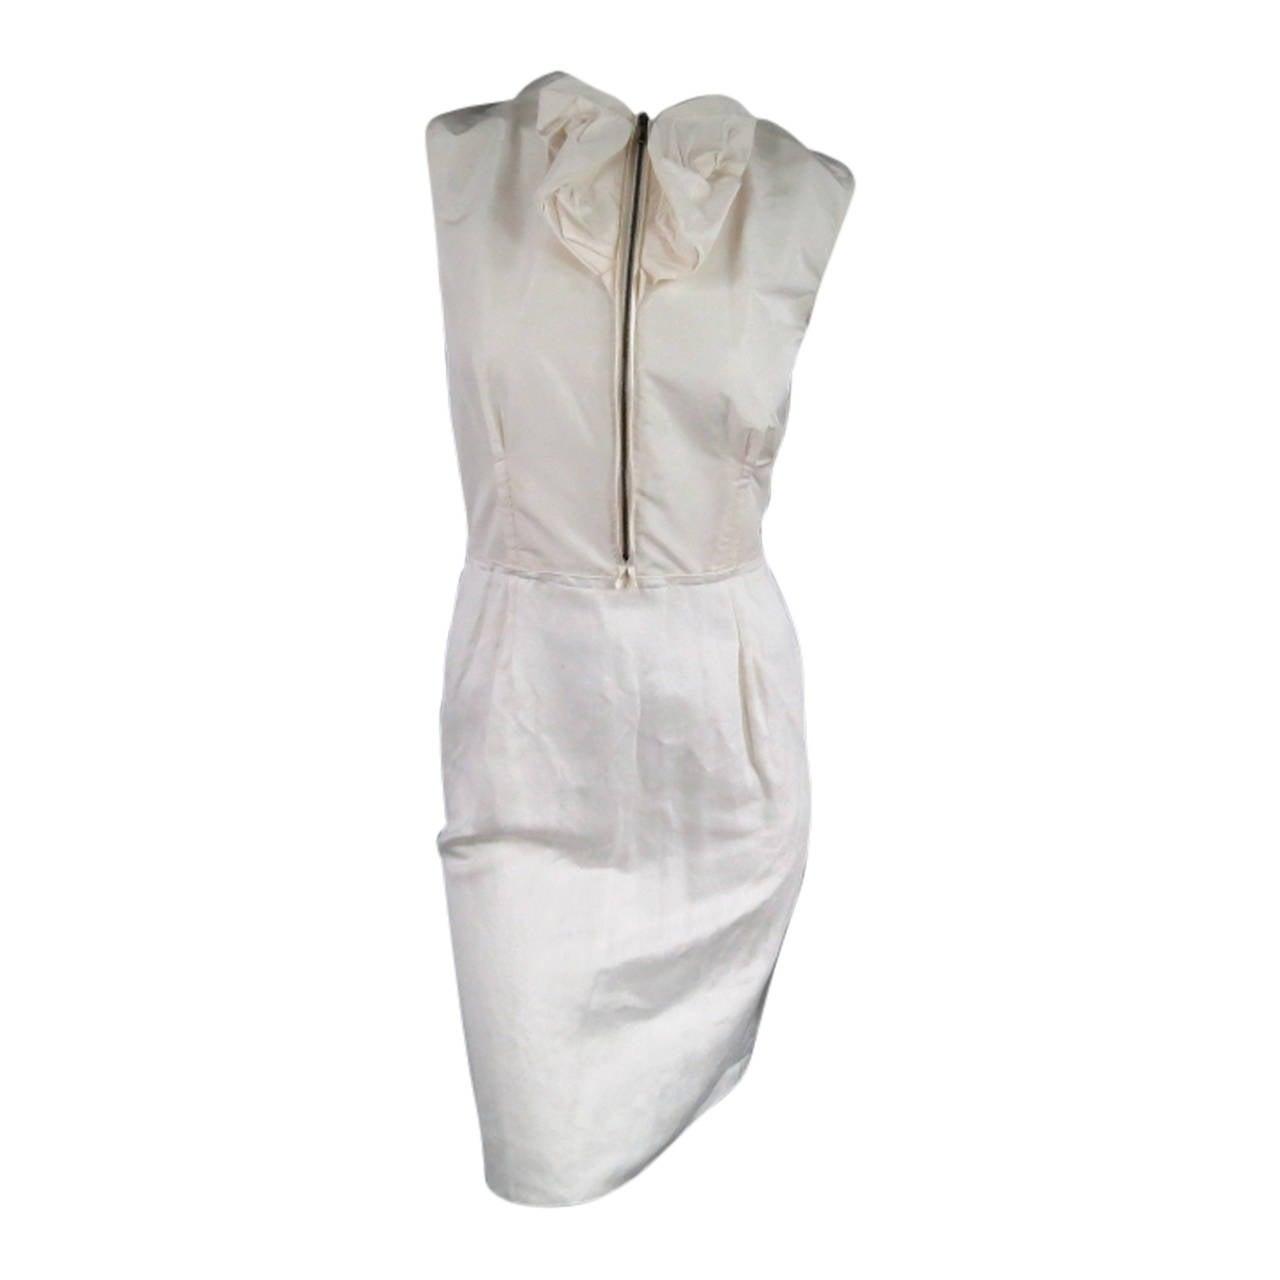 LANVIN Size 8 Cream Taffeta Zip Bow Fish Tail Cocktail Dress 1